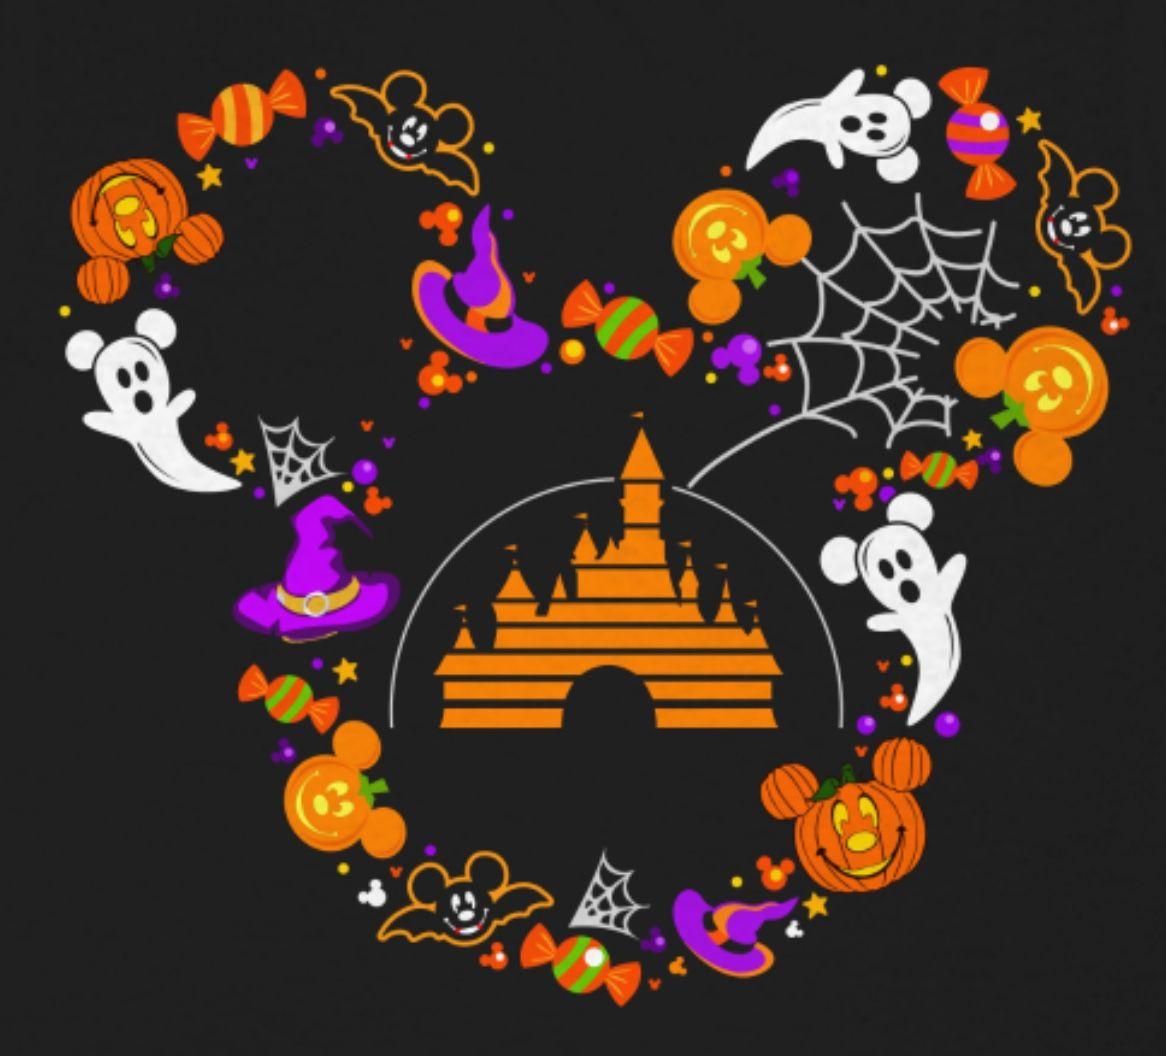 Pin By Rhonda James On Disney Shirts Mickey Halloween Halloween Wallpaper Disney Halloween